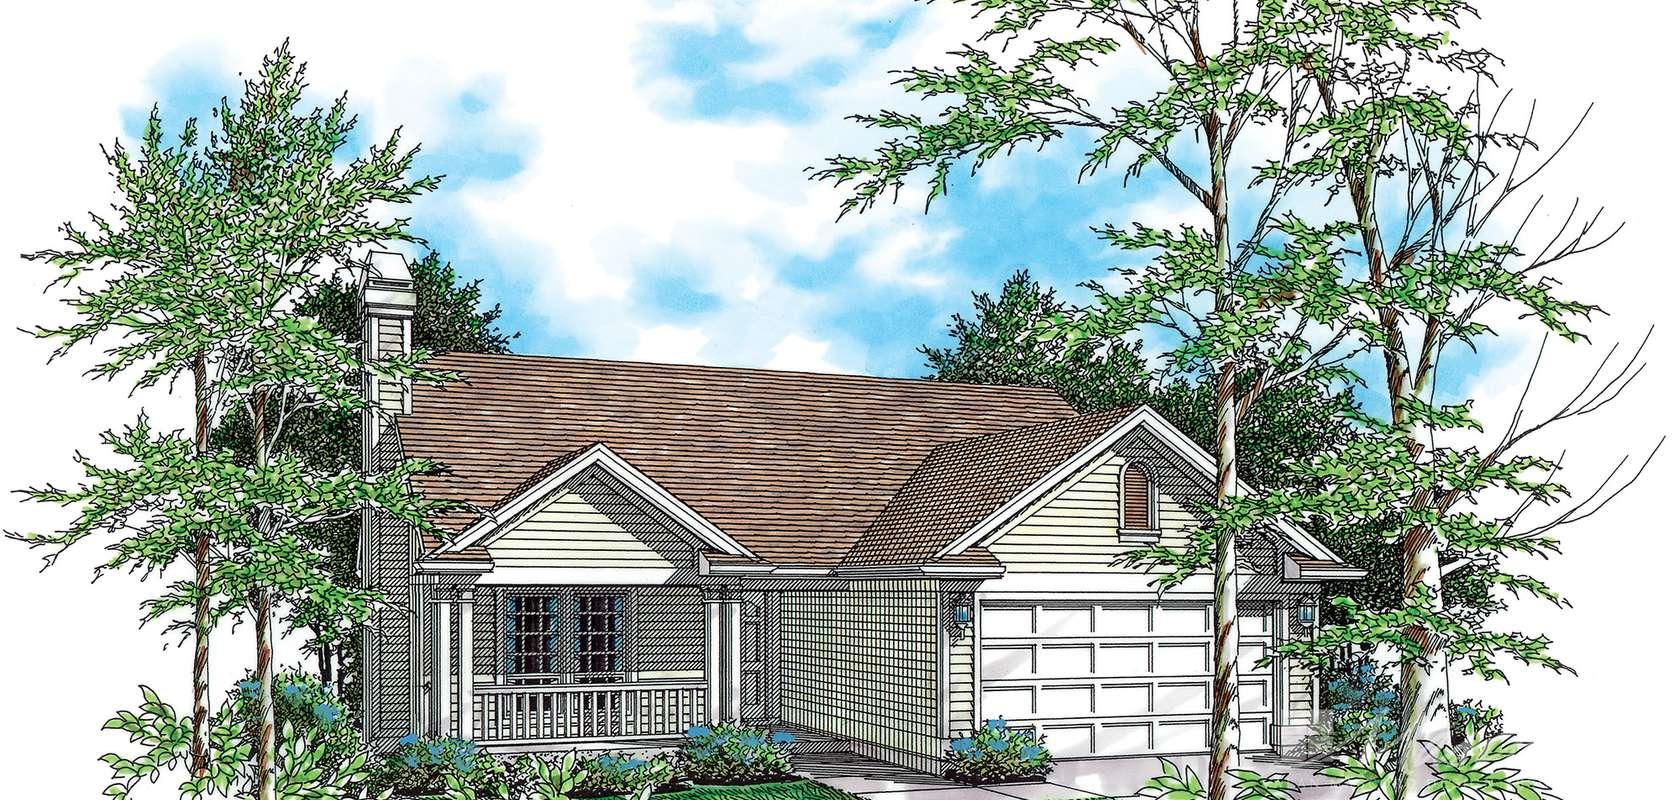 Mascord House Plan 1111A: The Woodbine